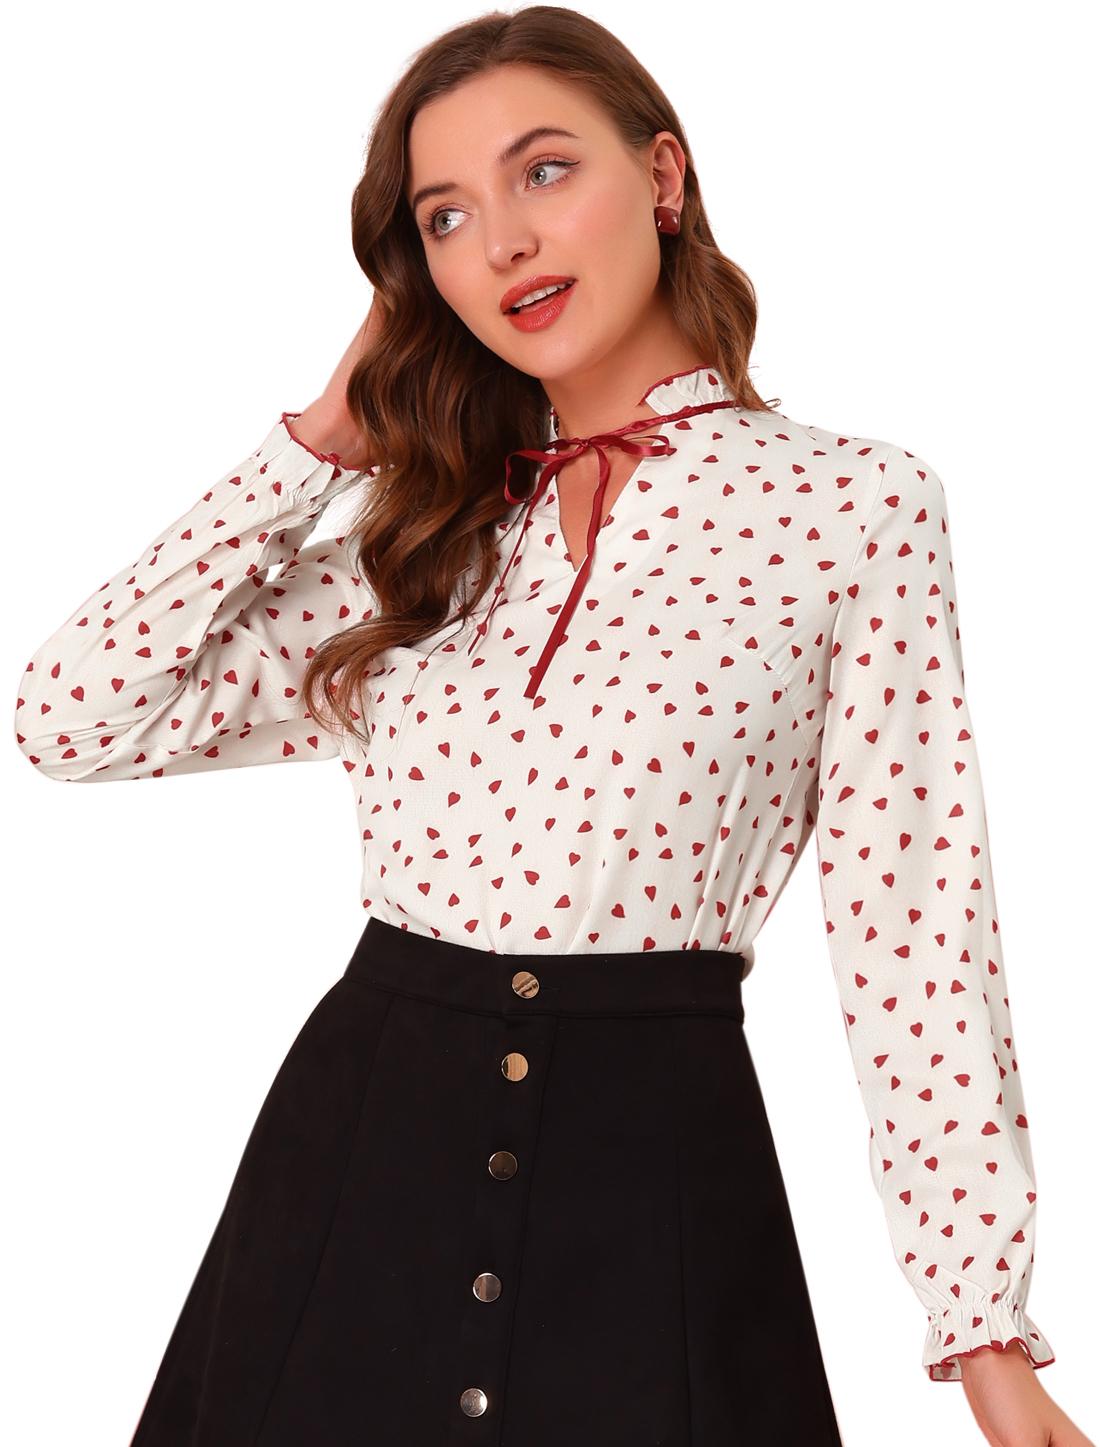 Allegra K Women's Tie Ruffled Neck Polka Dots Blouse Tops Beige Red S